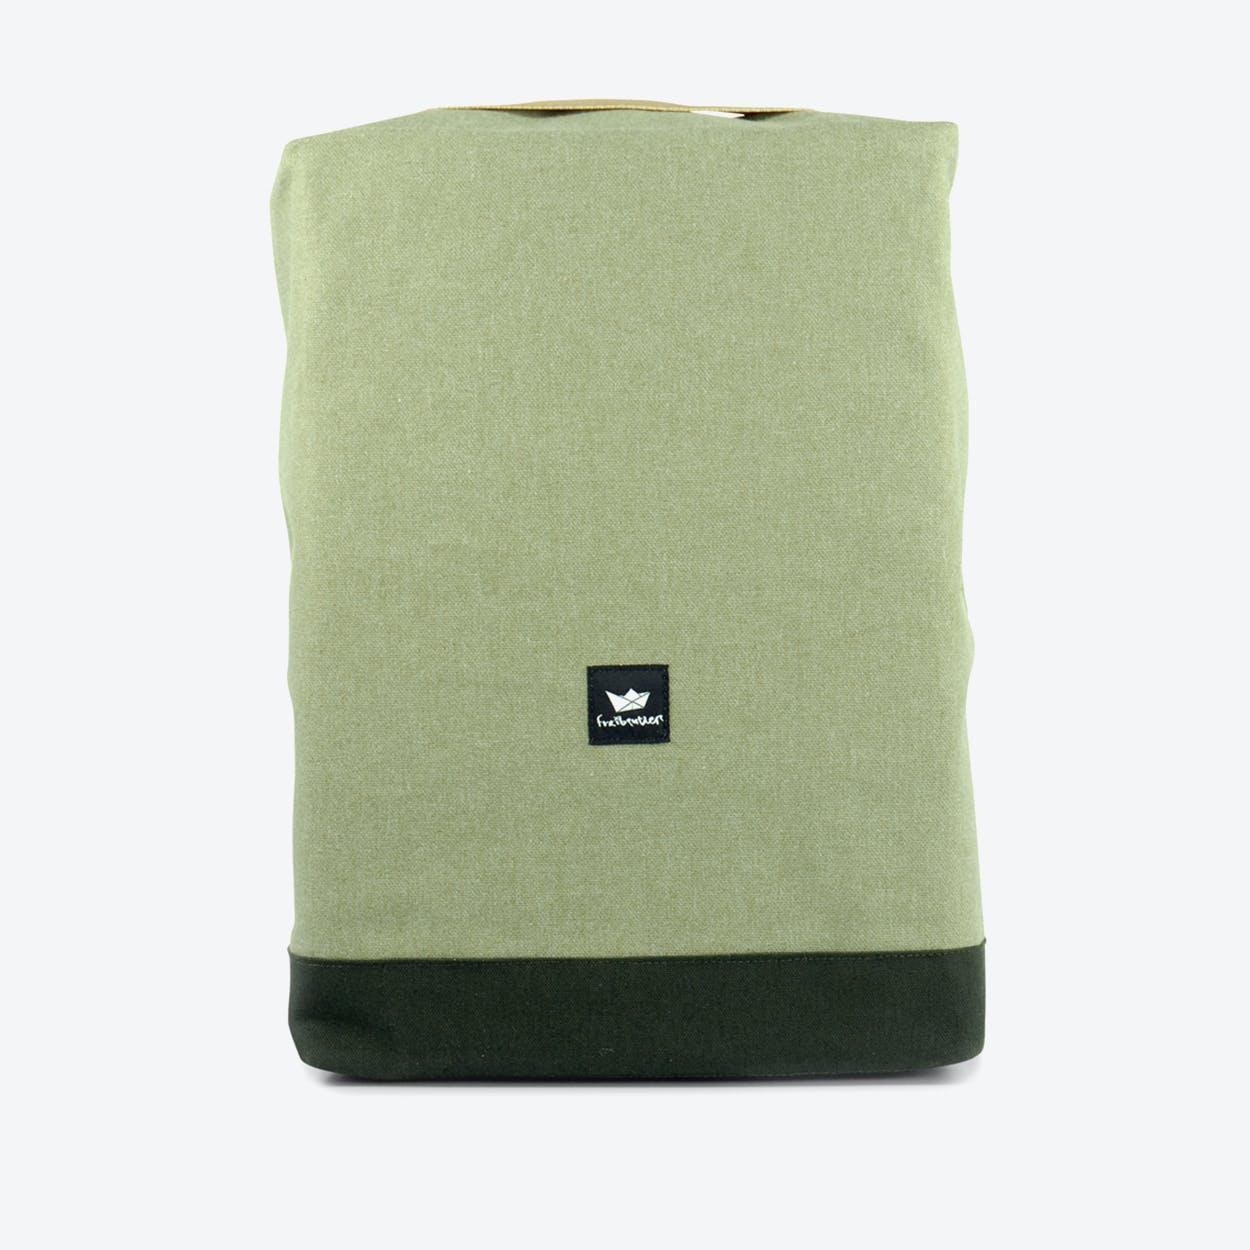 Backpack Tomy - Green